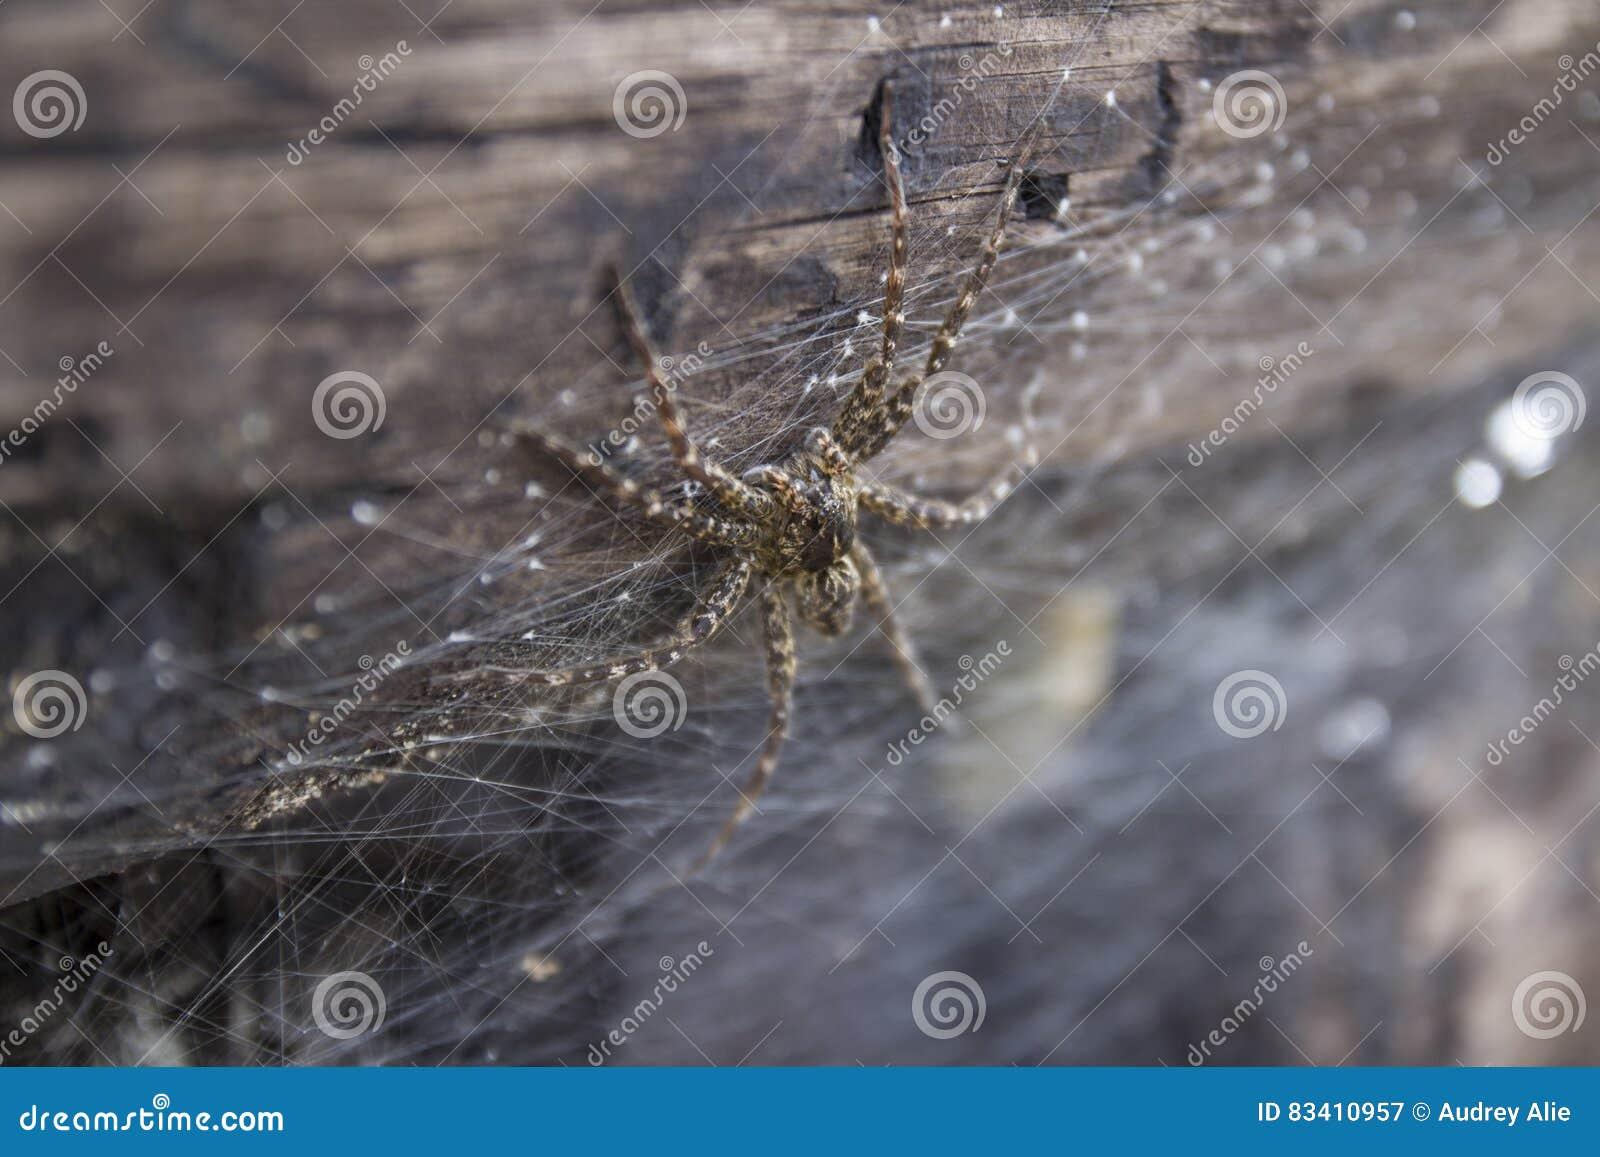 A Dolomedes Spider up close